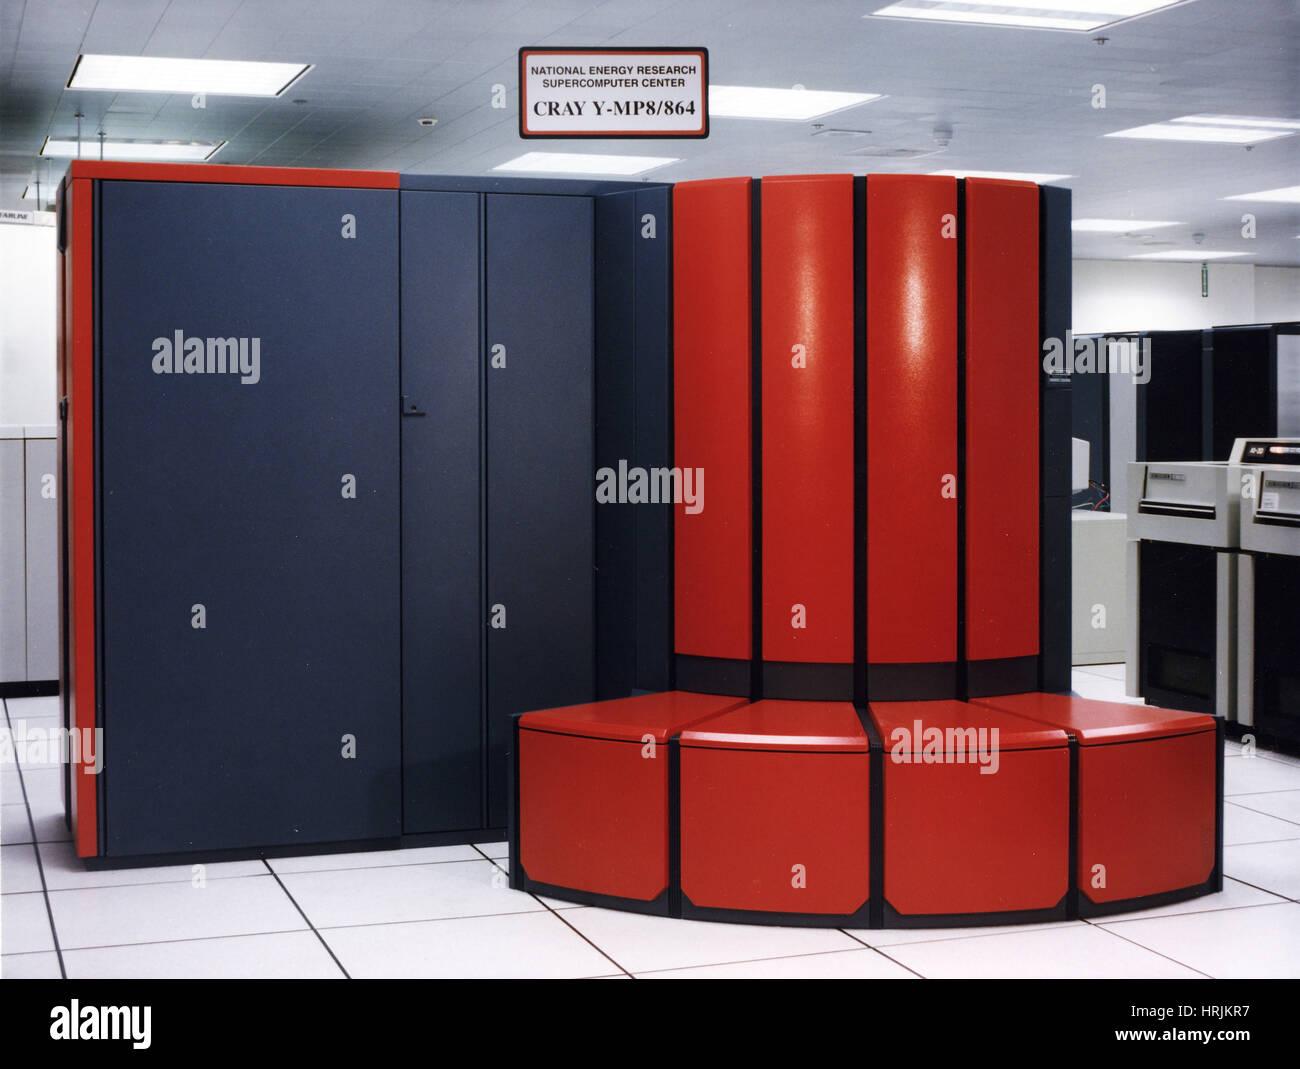 Cray Y-MP8/864 Supercomputer, LLNL, 1990s - Stock Image